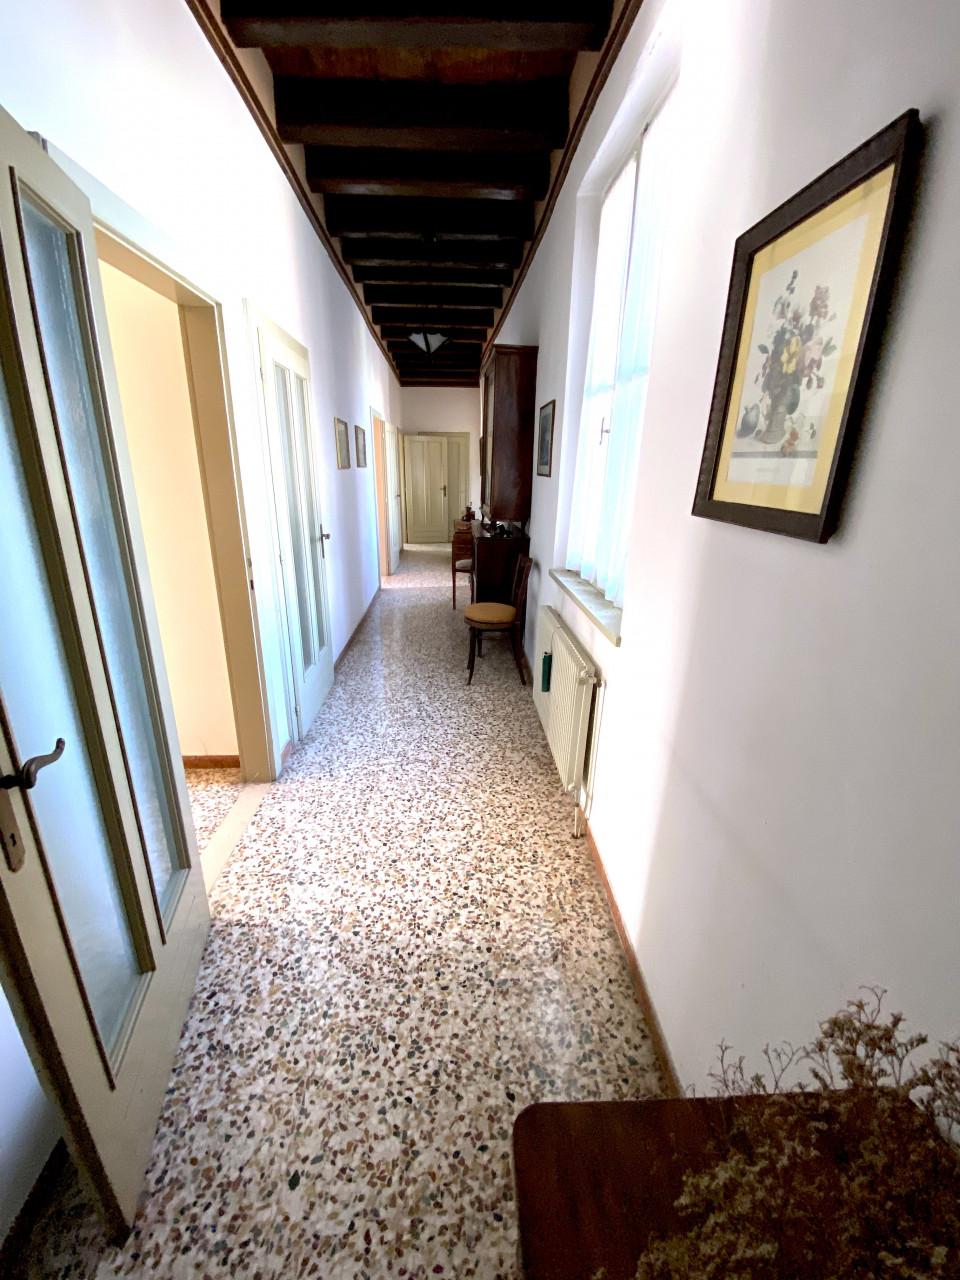 Dimora Storica in vendita in Centro a Valvasone - Rif.P1 https://images.gestionaleimmobiliare.it/foto/annunci/200820/2282895/1280x1280/011__img_3564.jpg